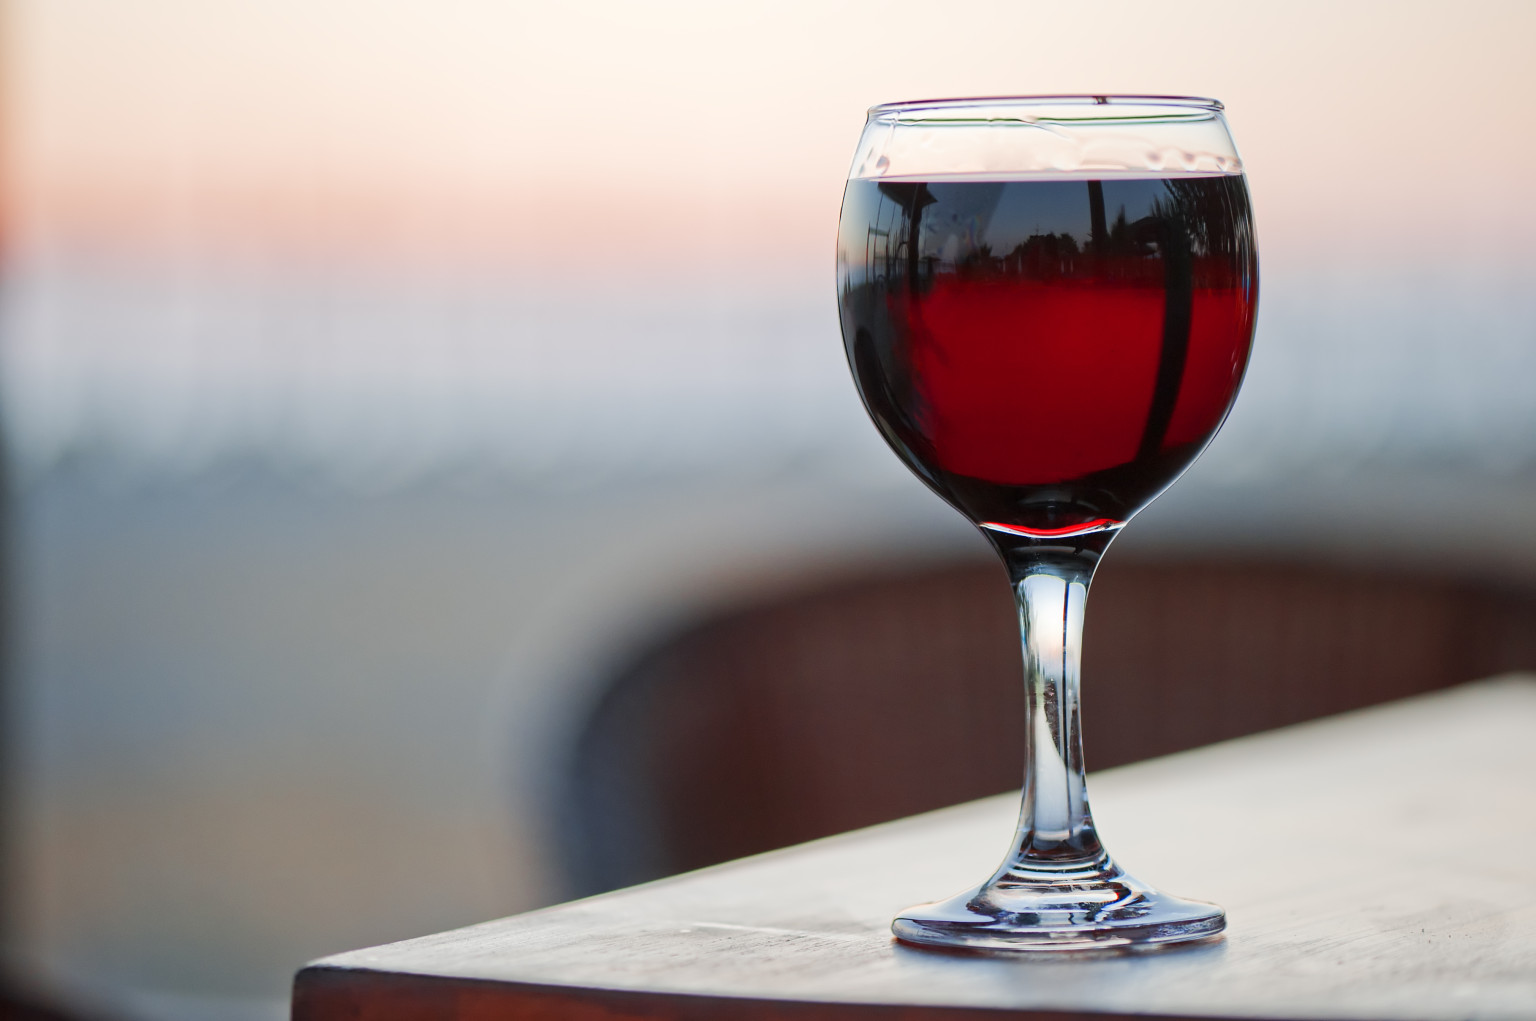 glass-of-wine-health-benefits.jpg